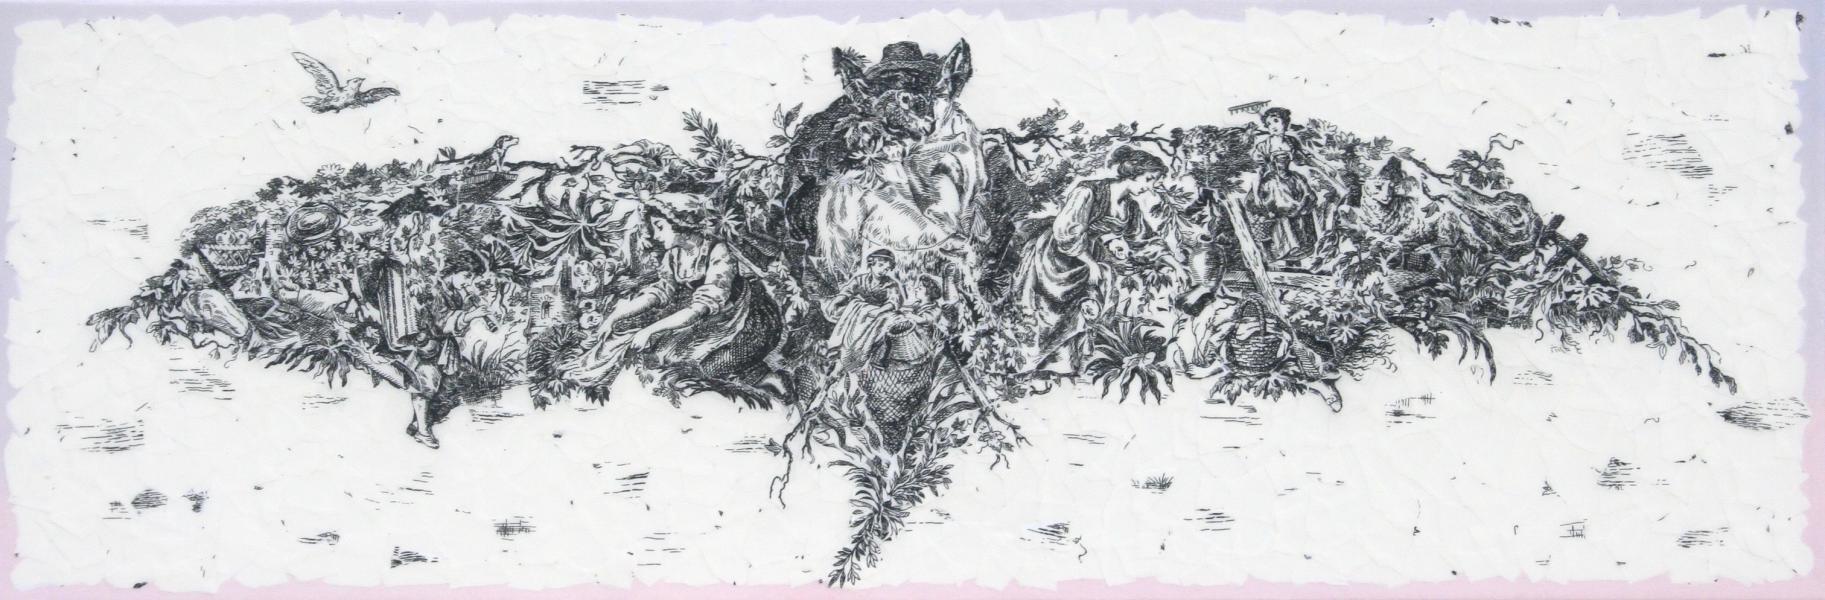 bat art, Kate Norris art, mixed media collage, superheroes art